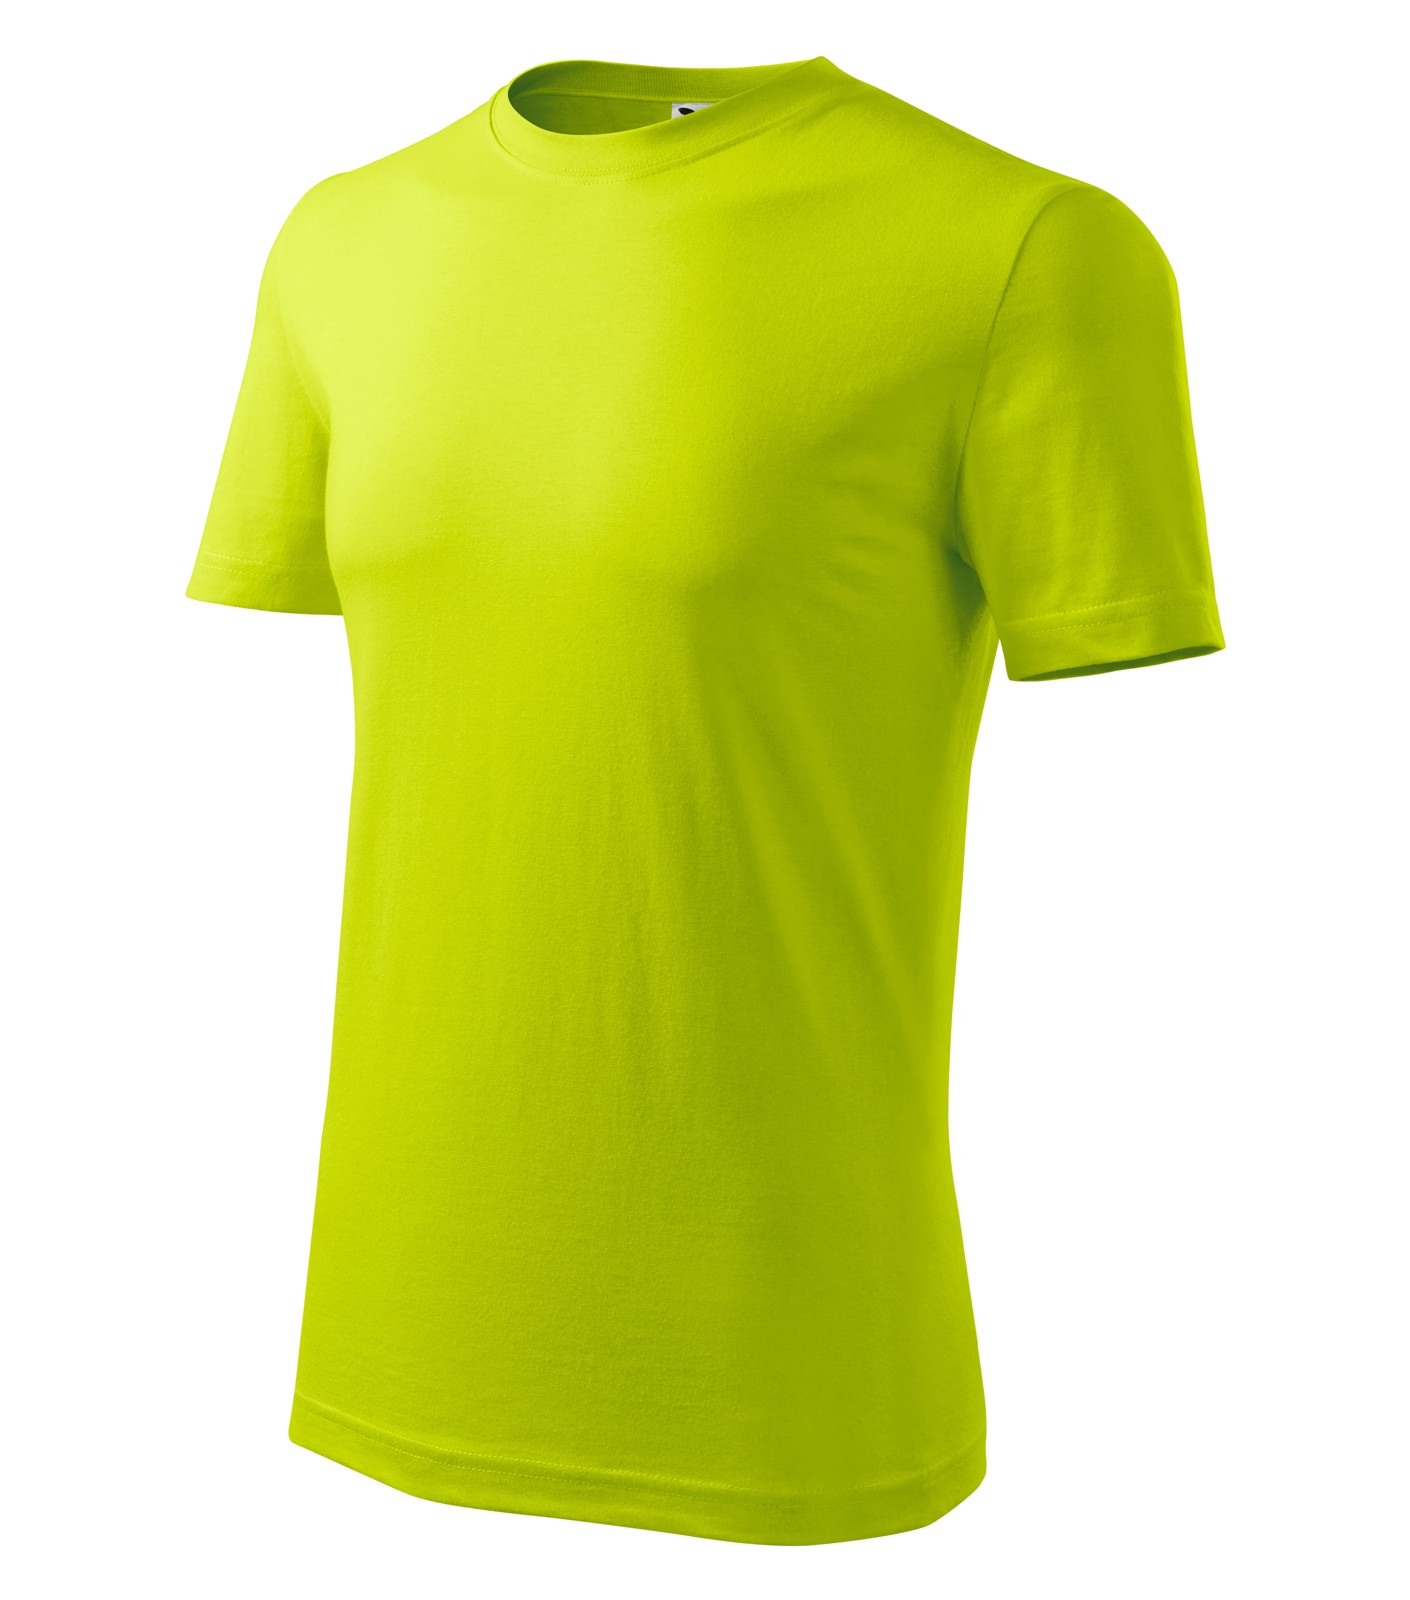 T-shirt men's Malfini Classic New - Lime Punch / L